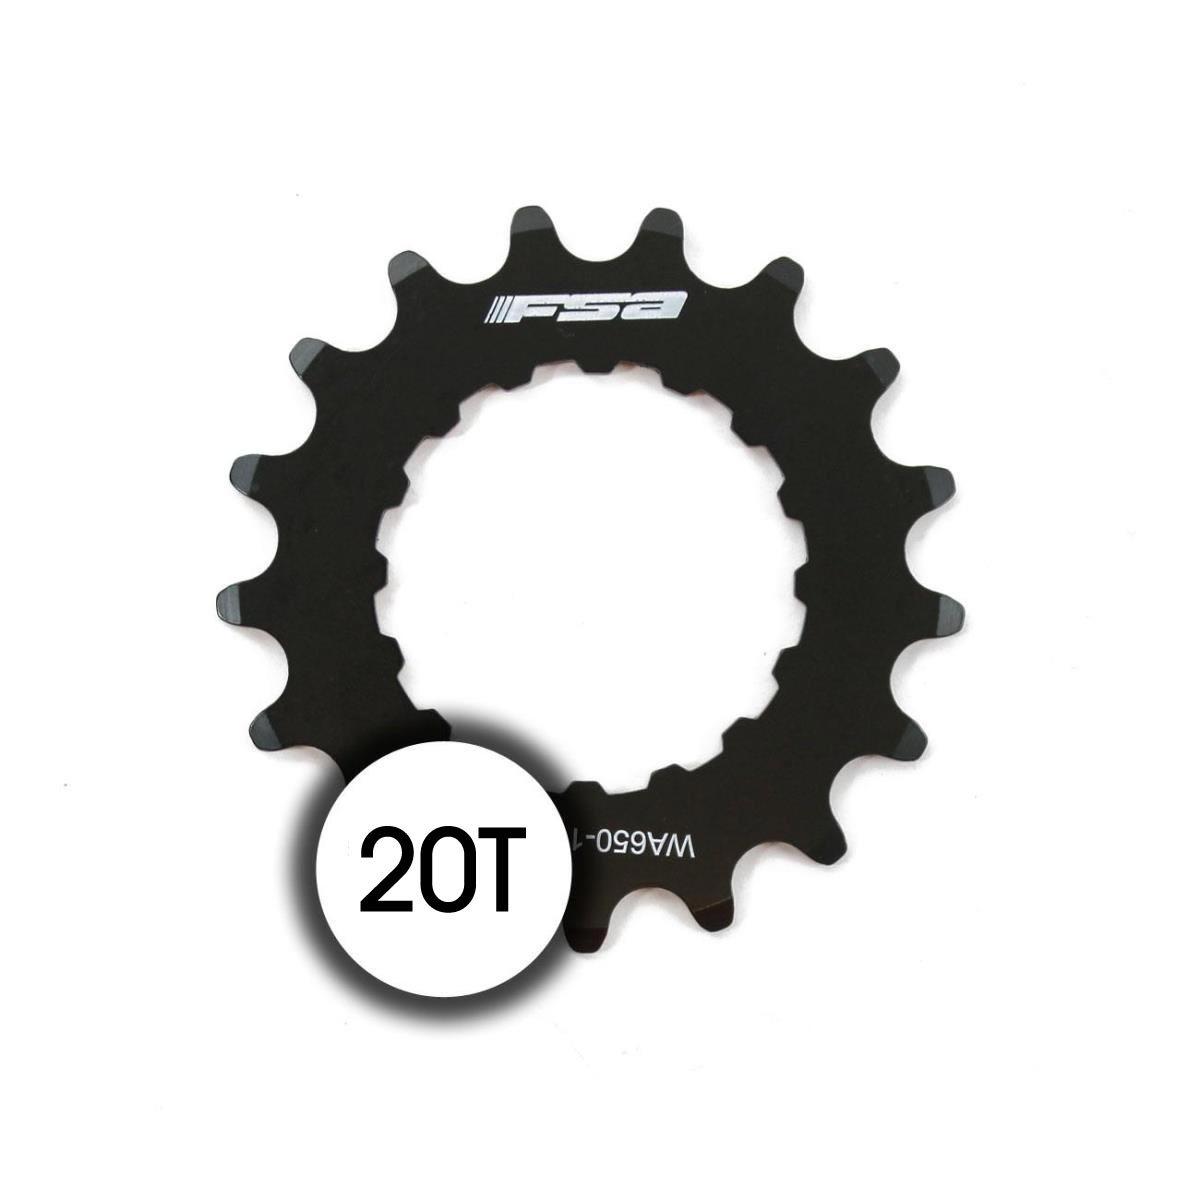 sprocket 20t bosch ebike chainring wa653 stainless steel black